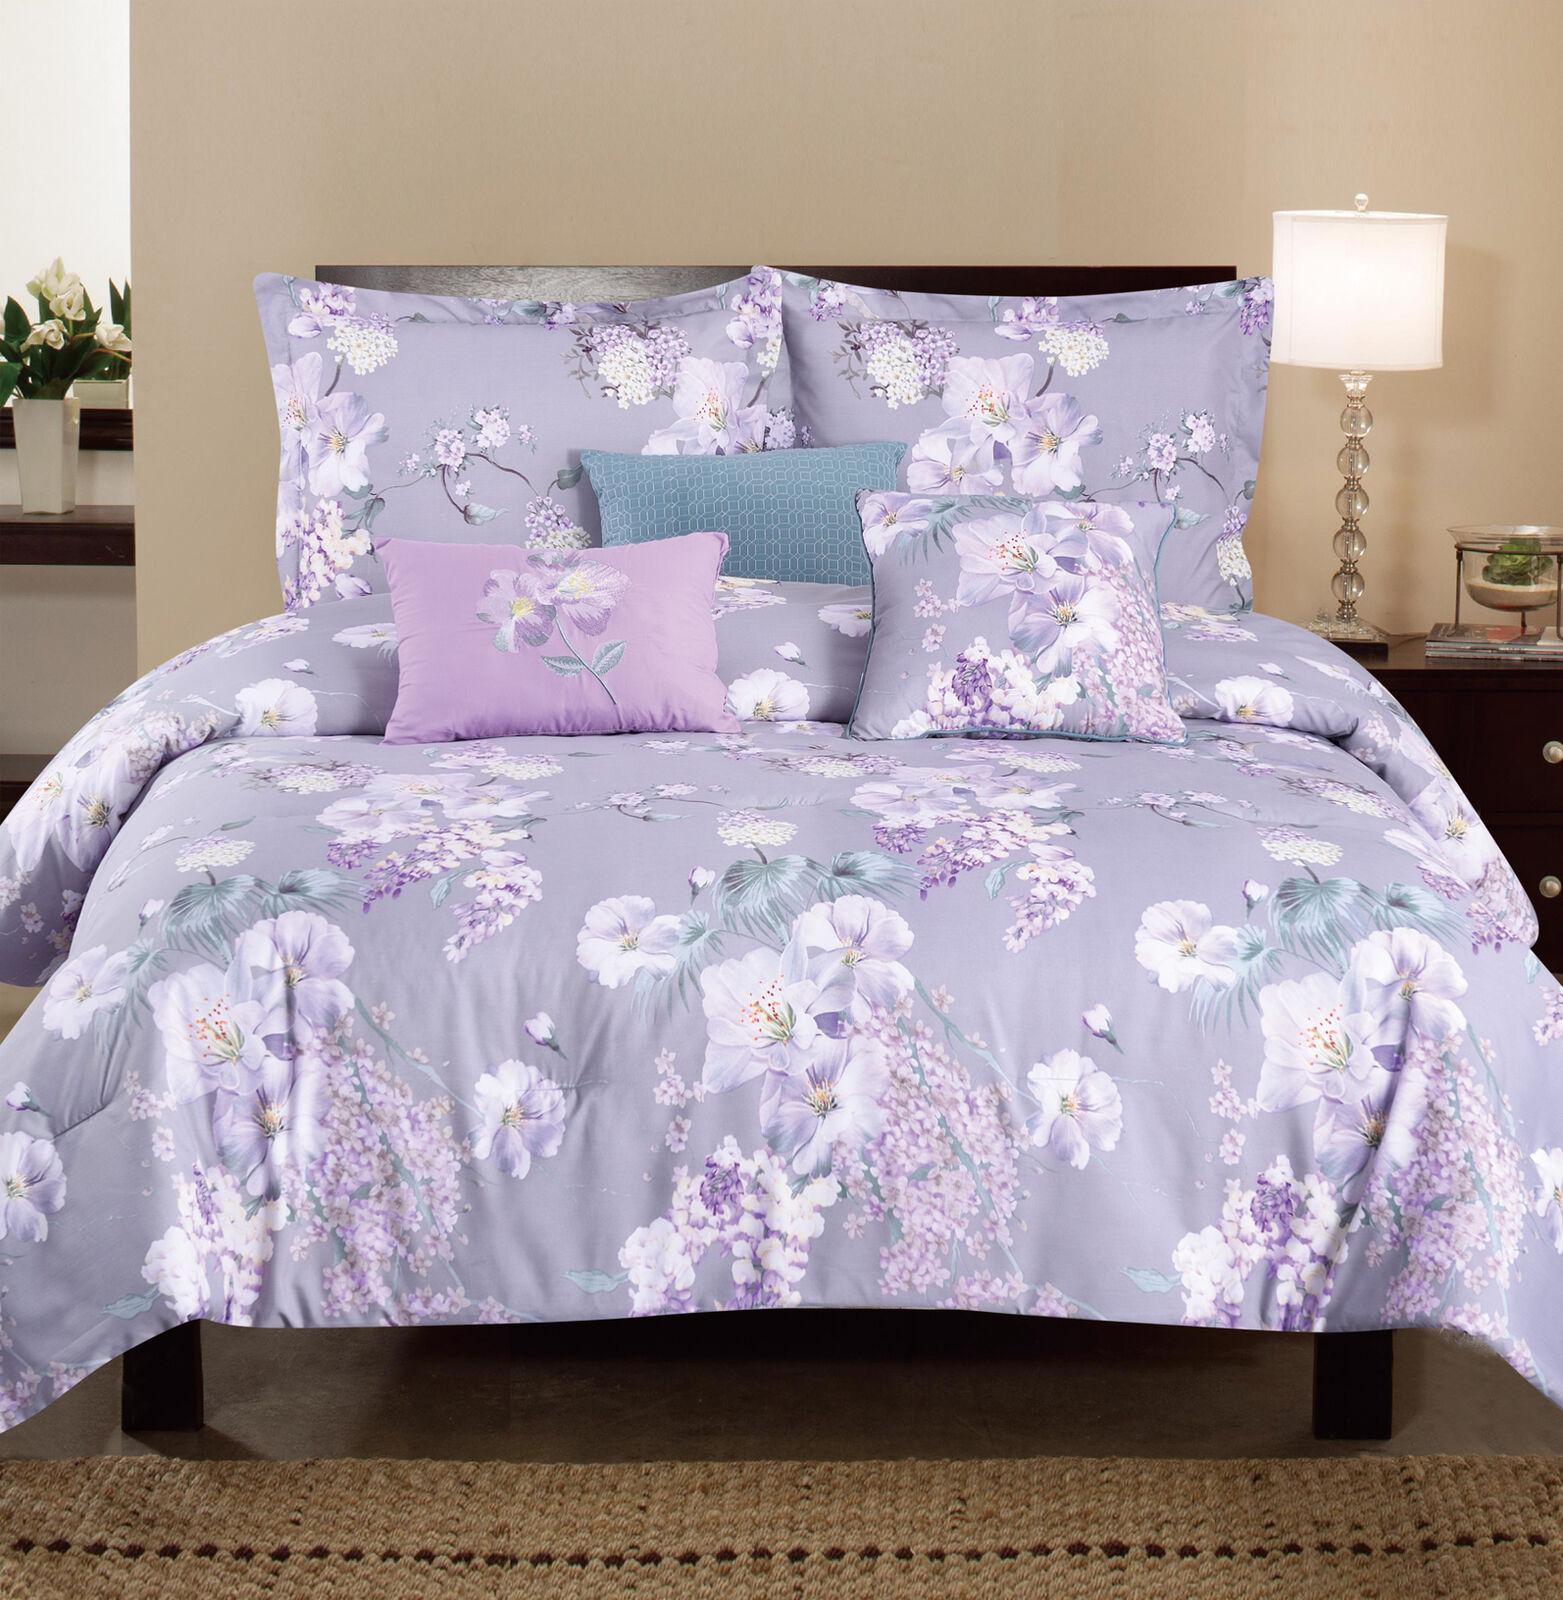 6PC Puple Flower with Leaves Printed Floral OverGröße+Overfilled Comforter Set